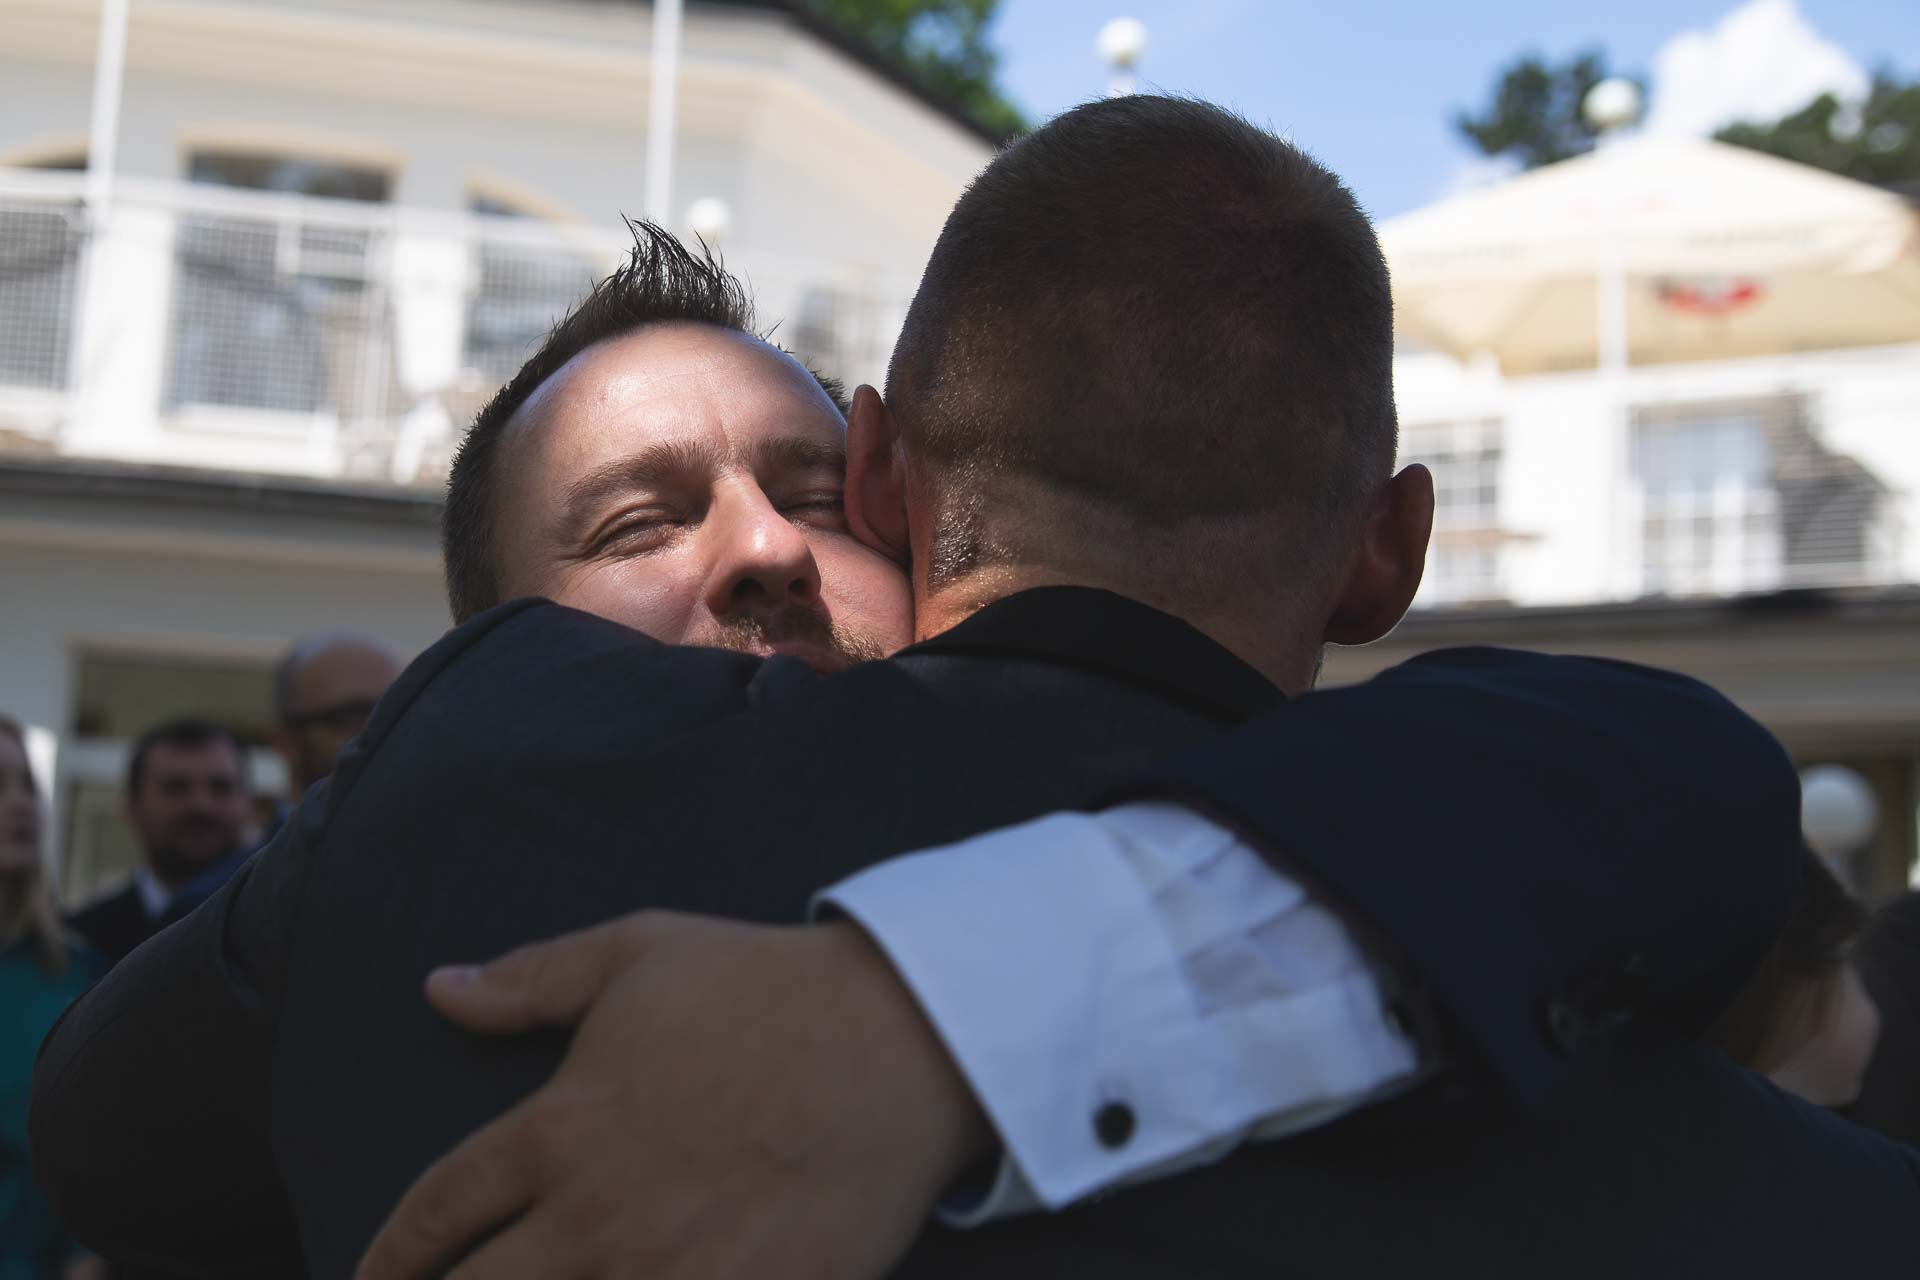 svatební-fotograf-svatebni-video-Nymburk-hotel-Ostrov-Beautyfoto-5284